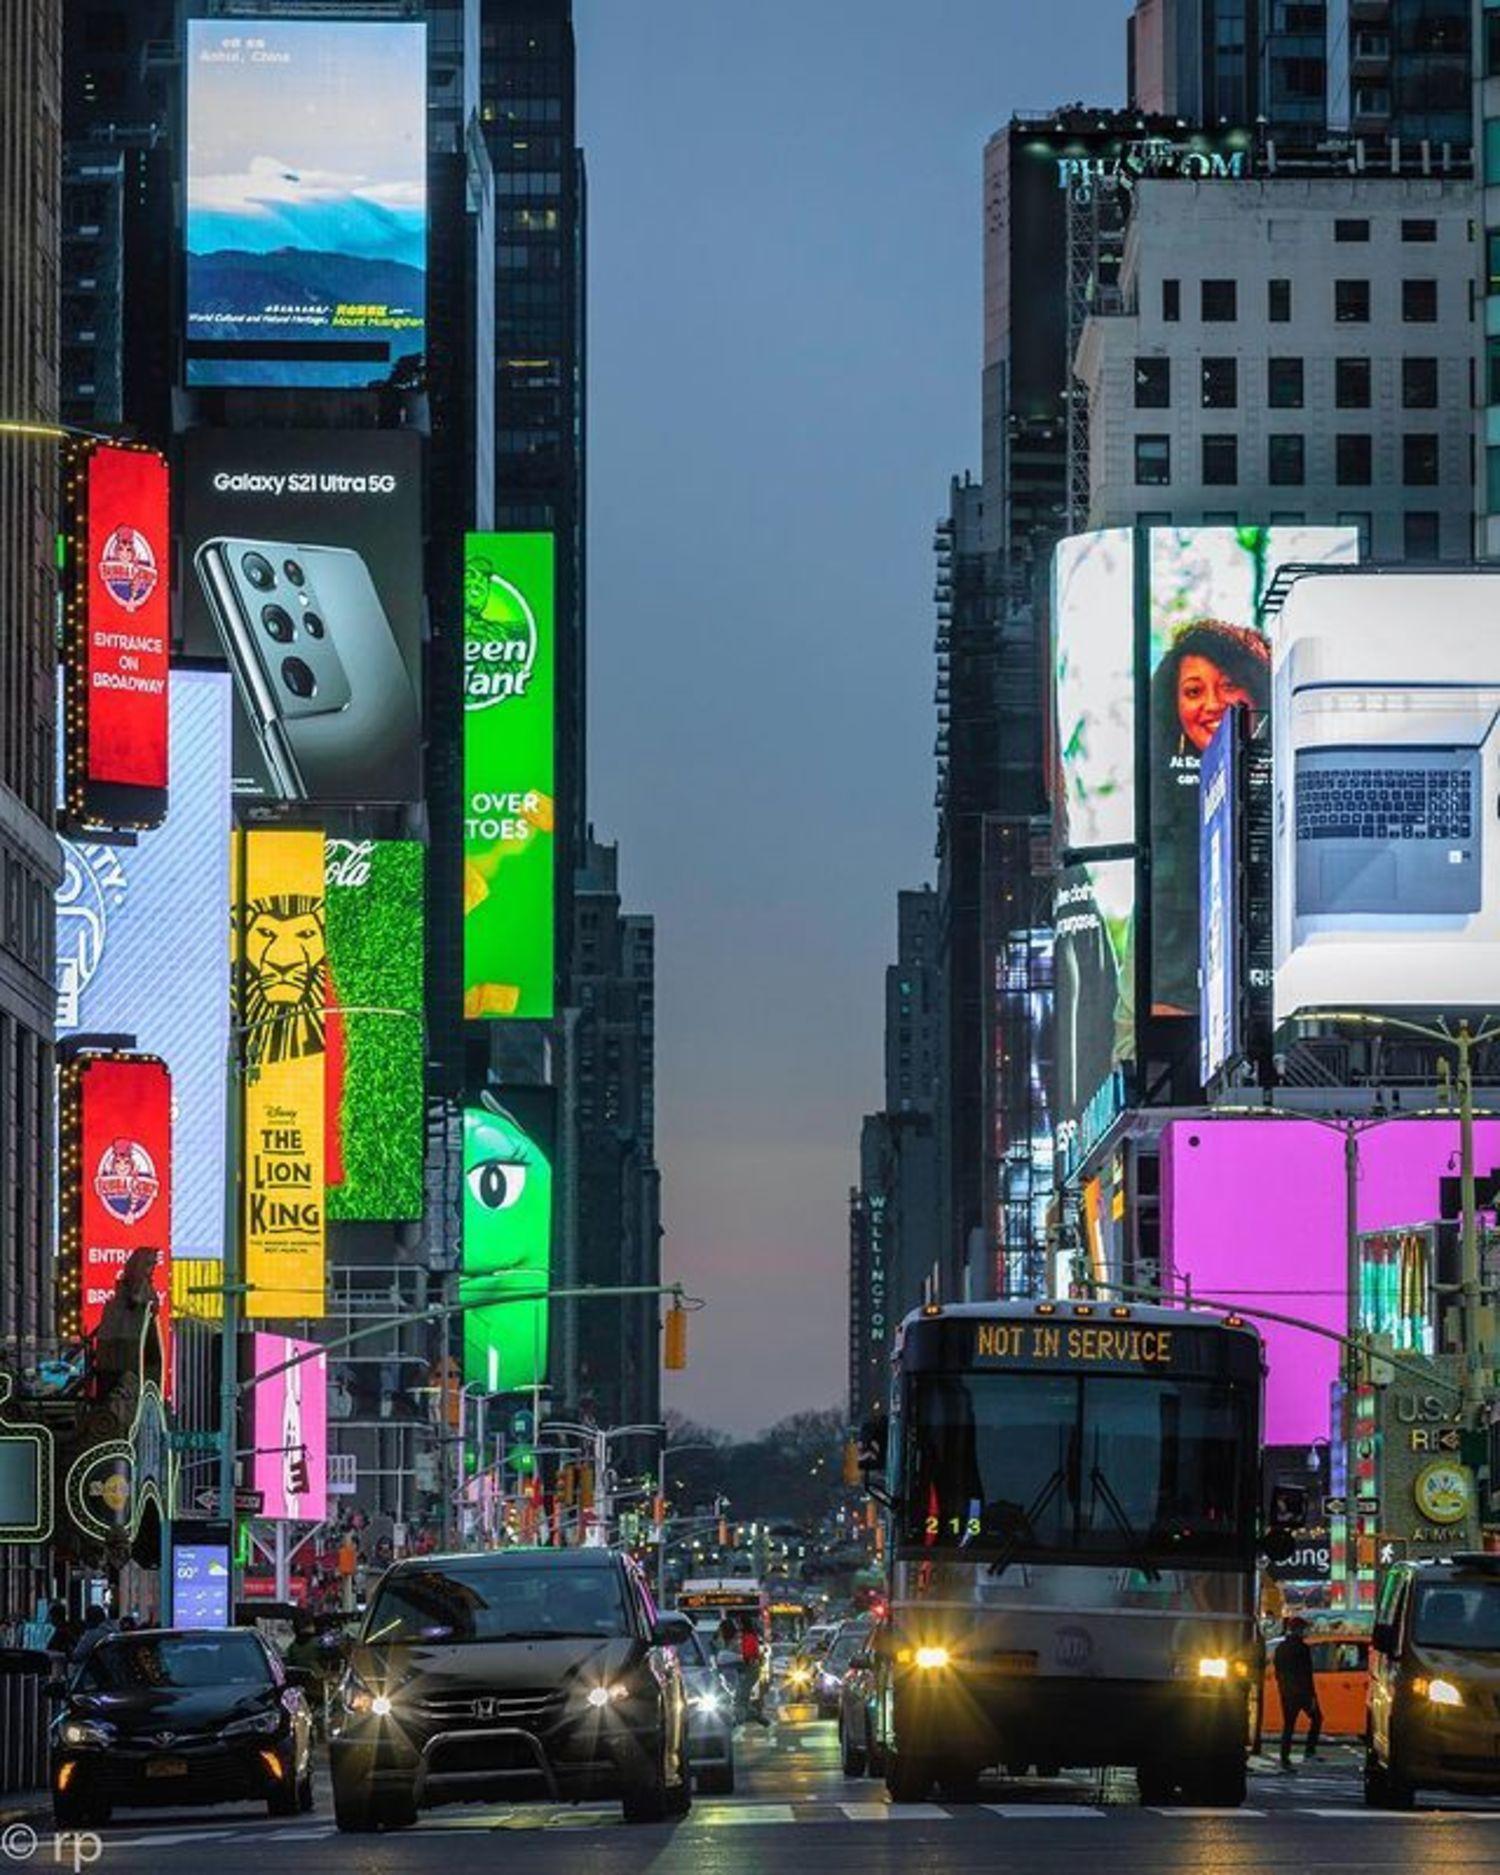 7th Avenue, Times Square, Midtown, Manhattan